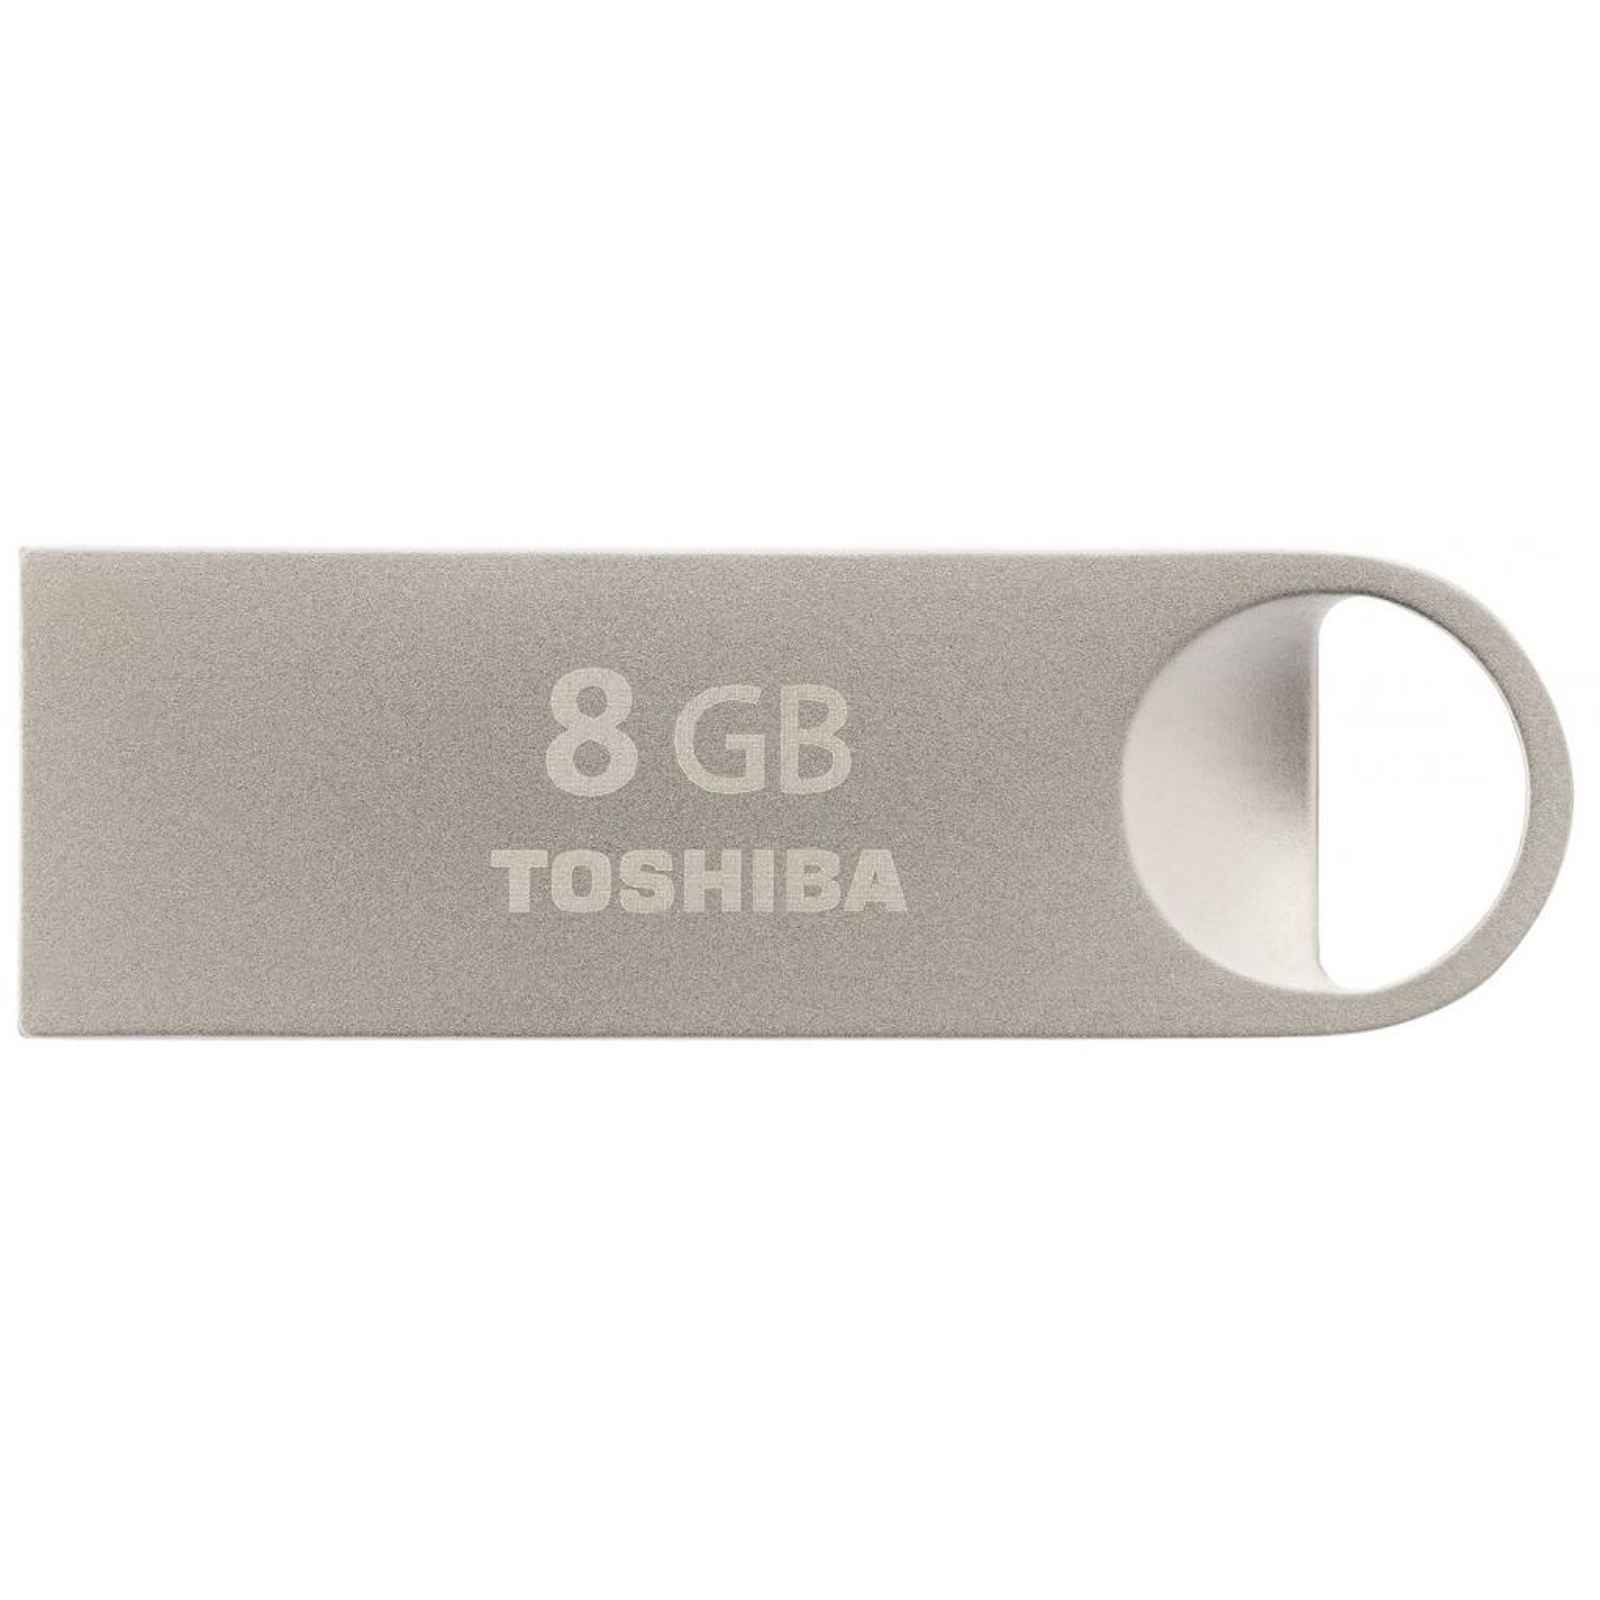 USB флеш накопитель TOSHIBA 8GB Owari Metal USB 2.0 (THN-U401S0080E4)